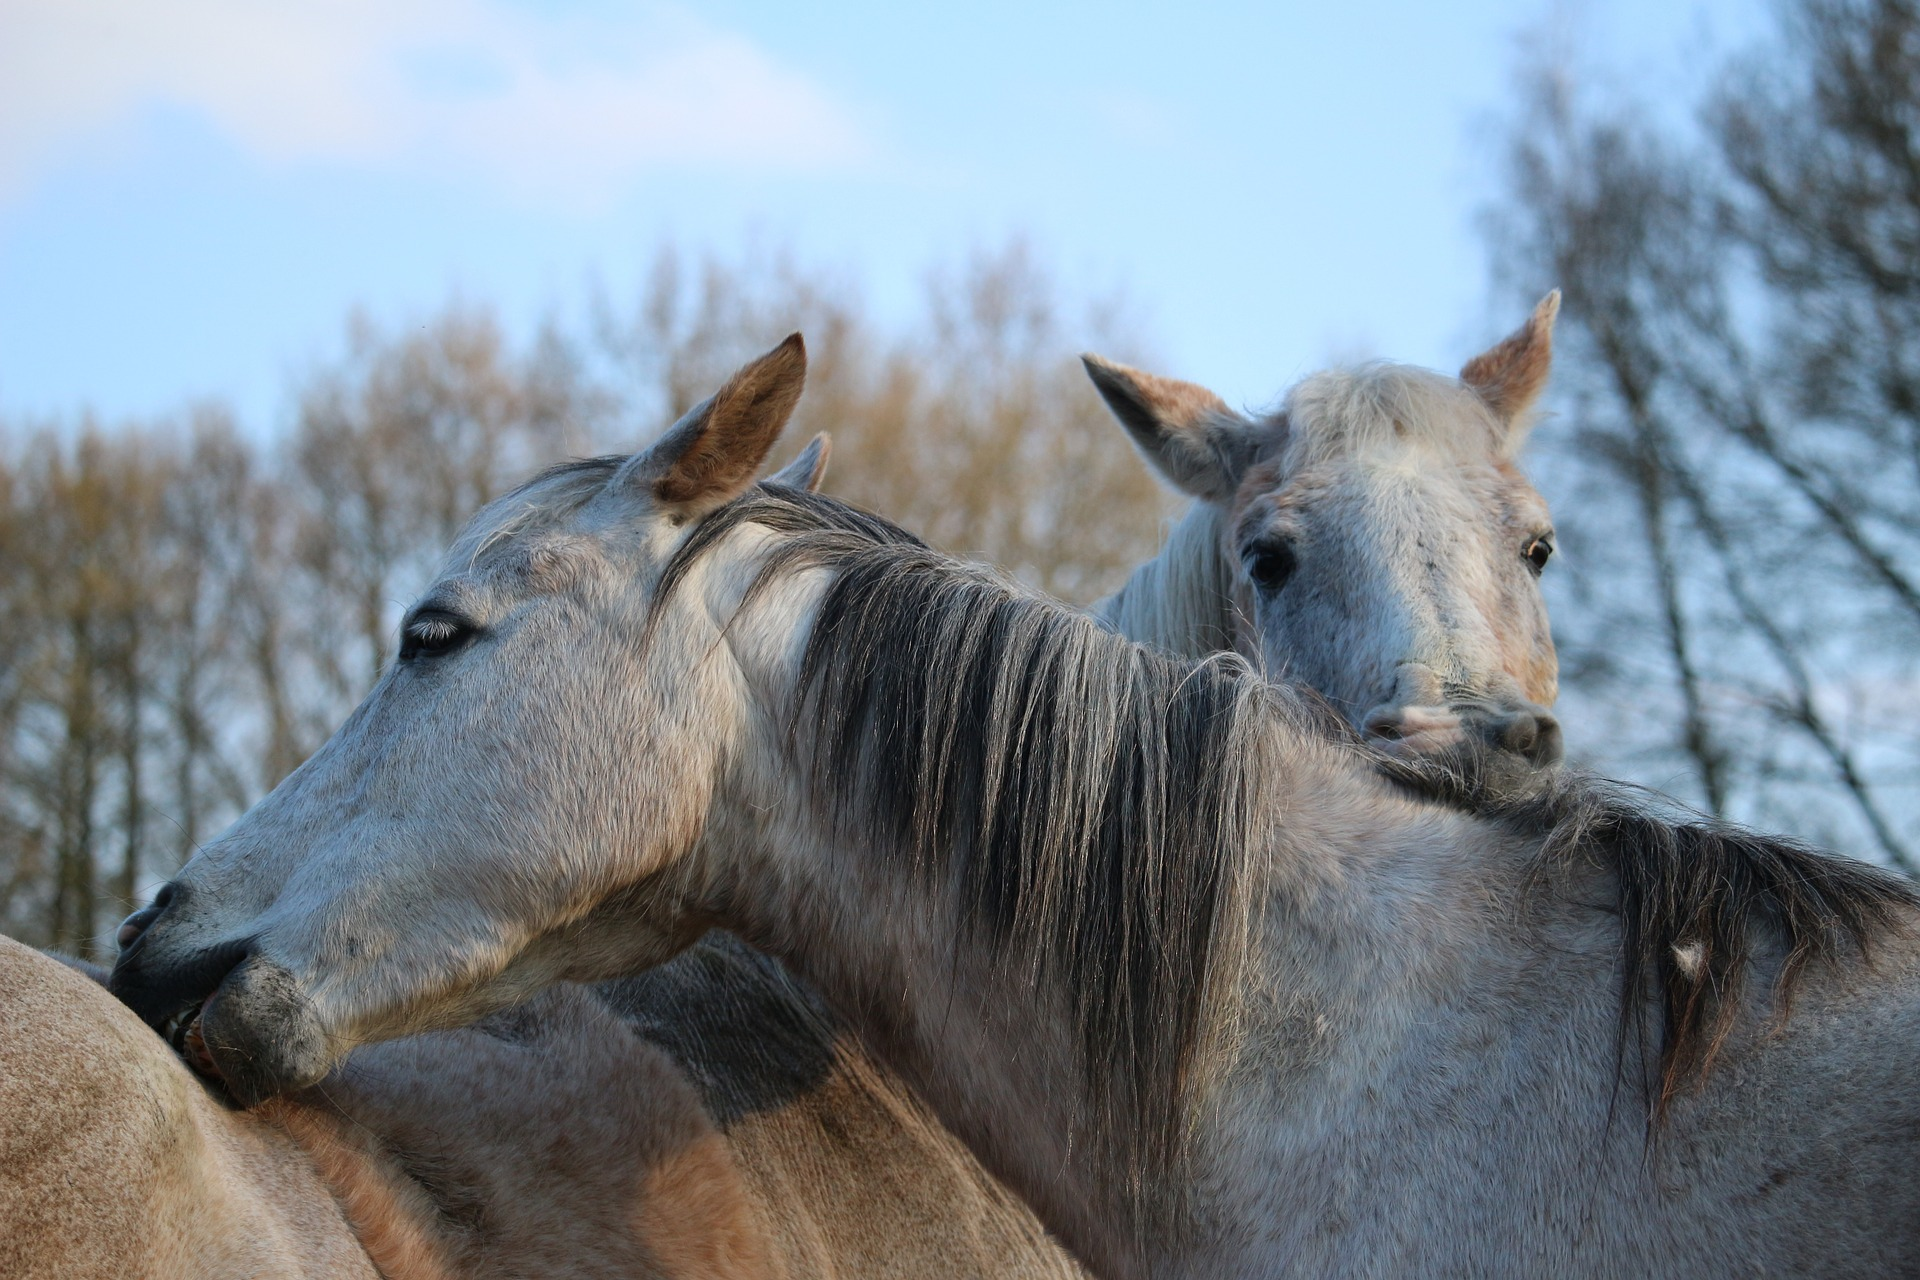 horse-1329619_1920